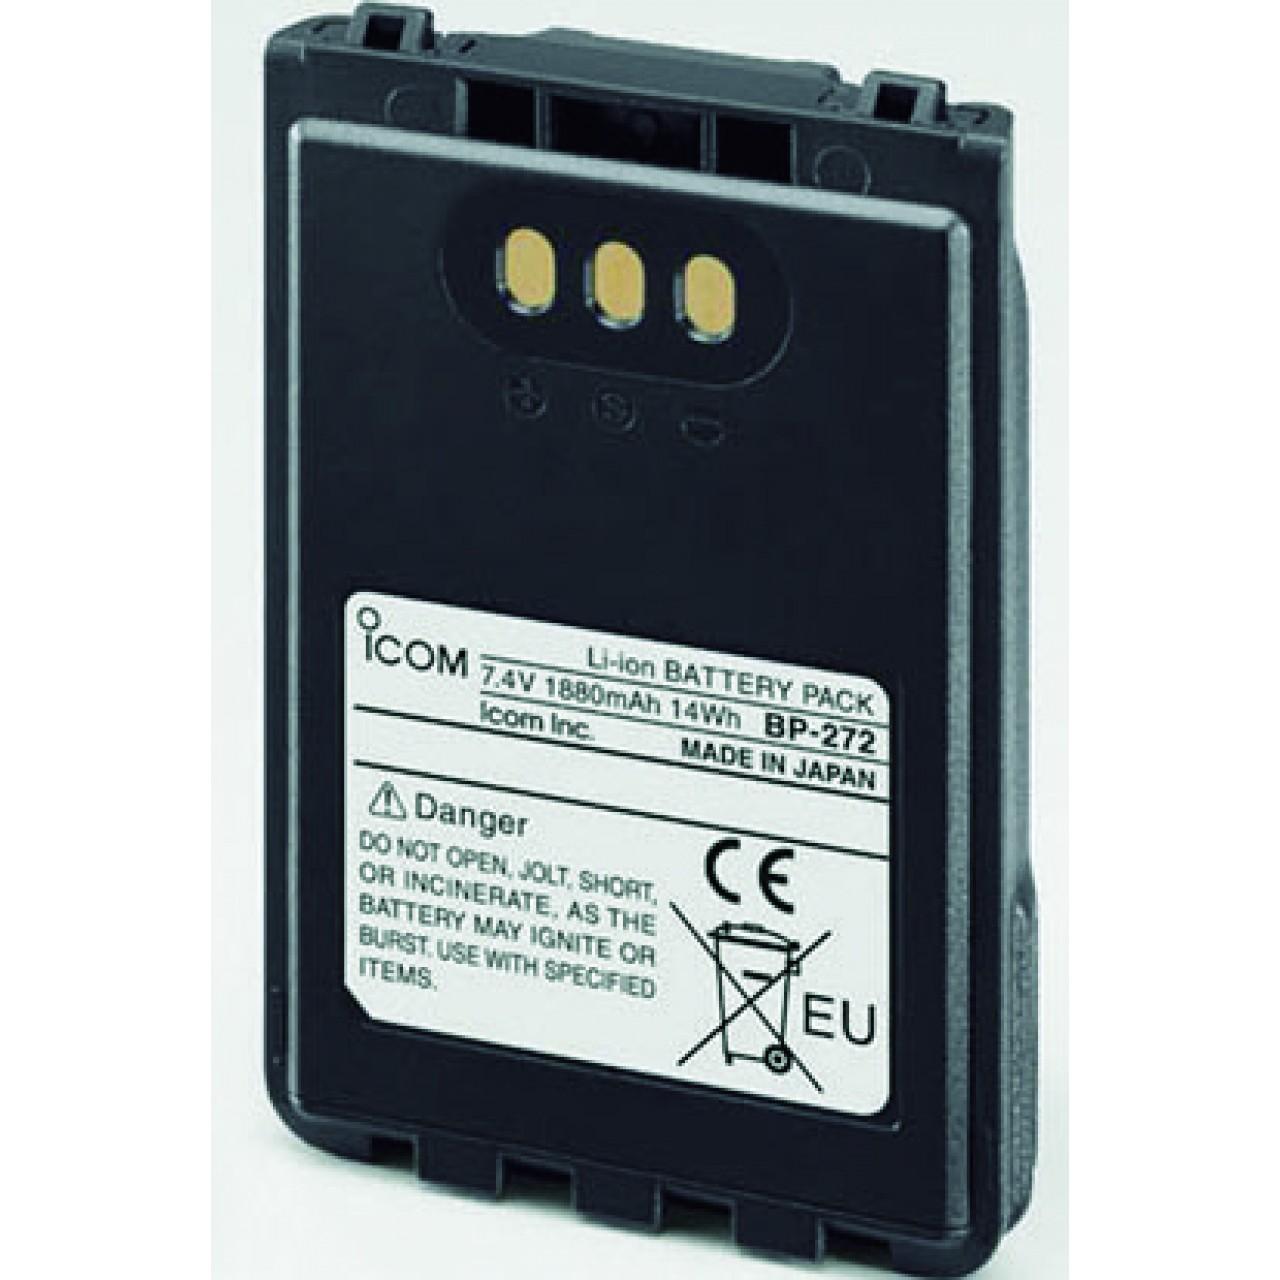 BP-272 Batteries - ICOM